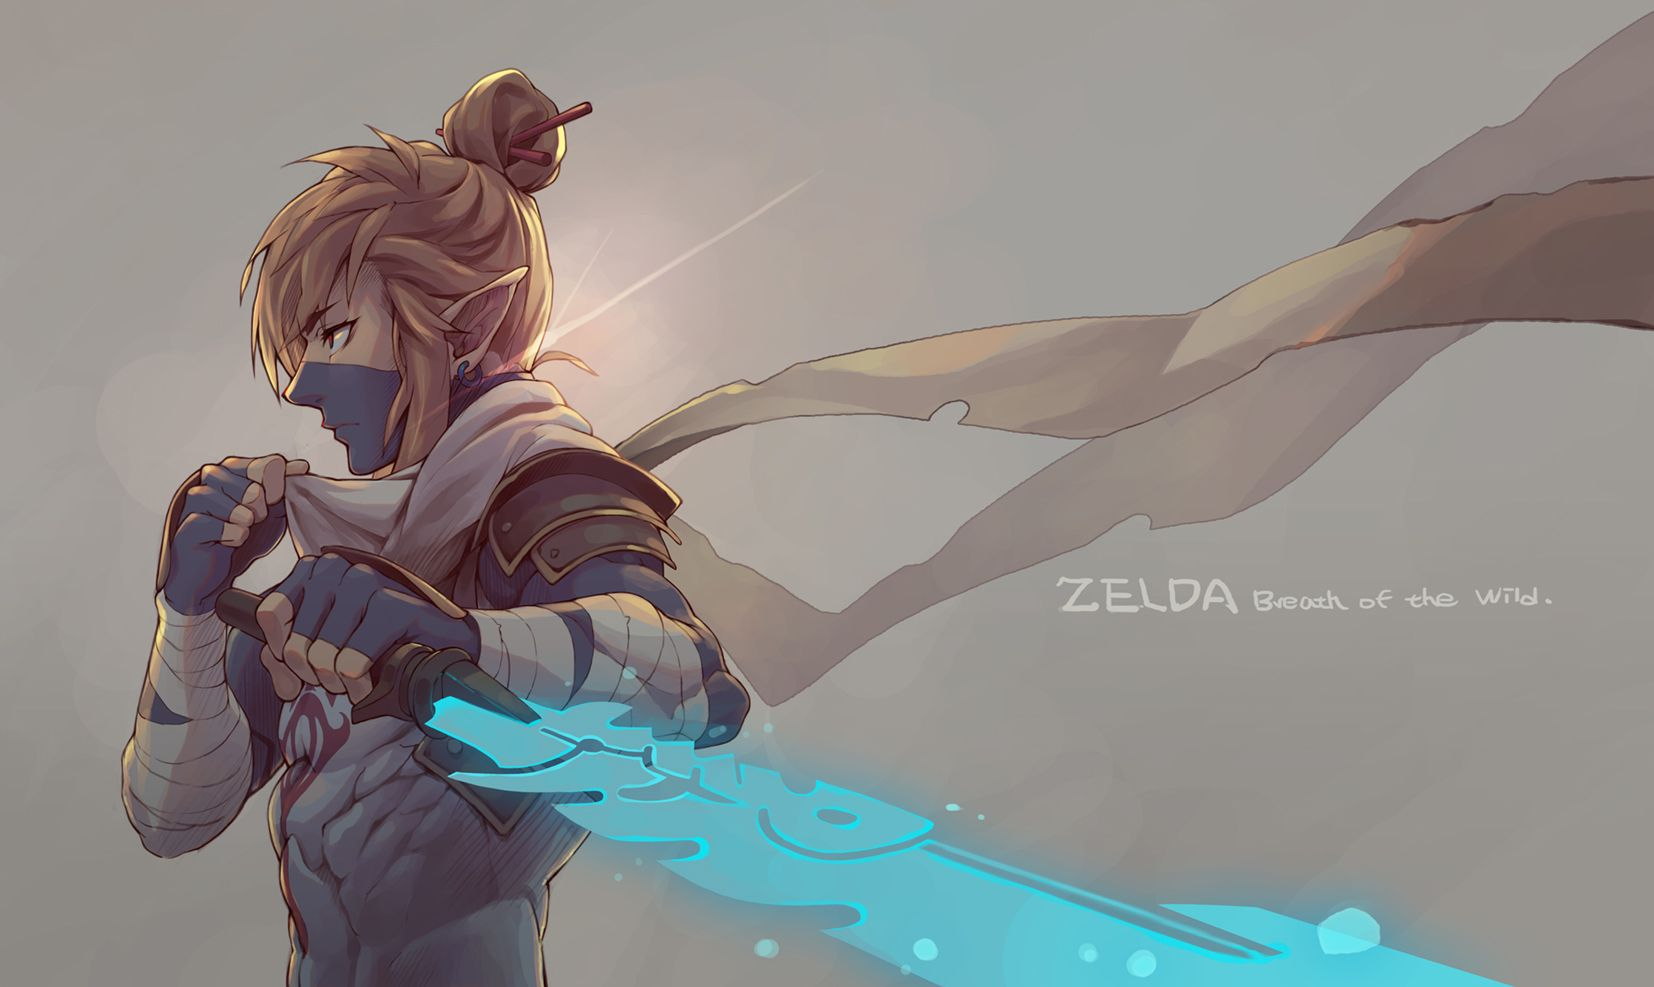 Breath Of The Wild Sheikah Link Anime Wallpaper Legend Of Zelda Breath Of The Wild